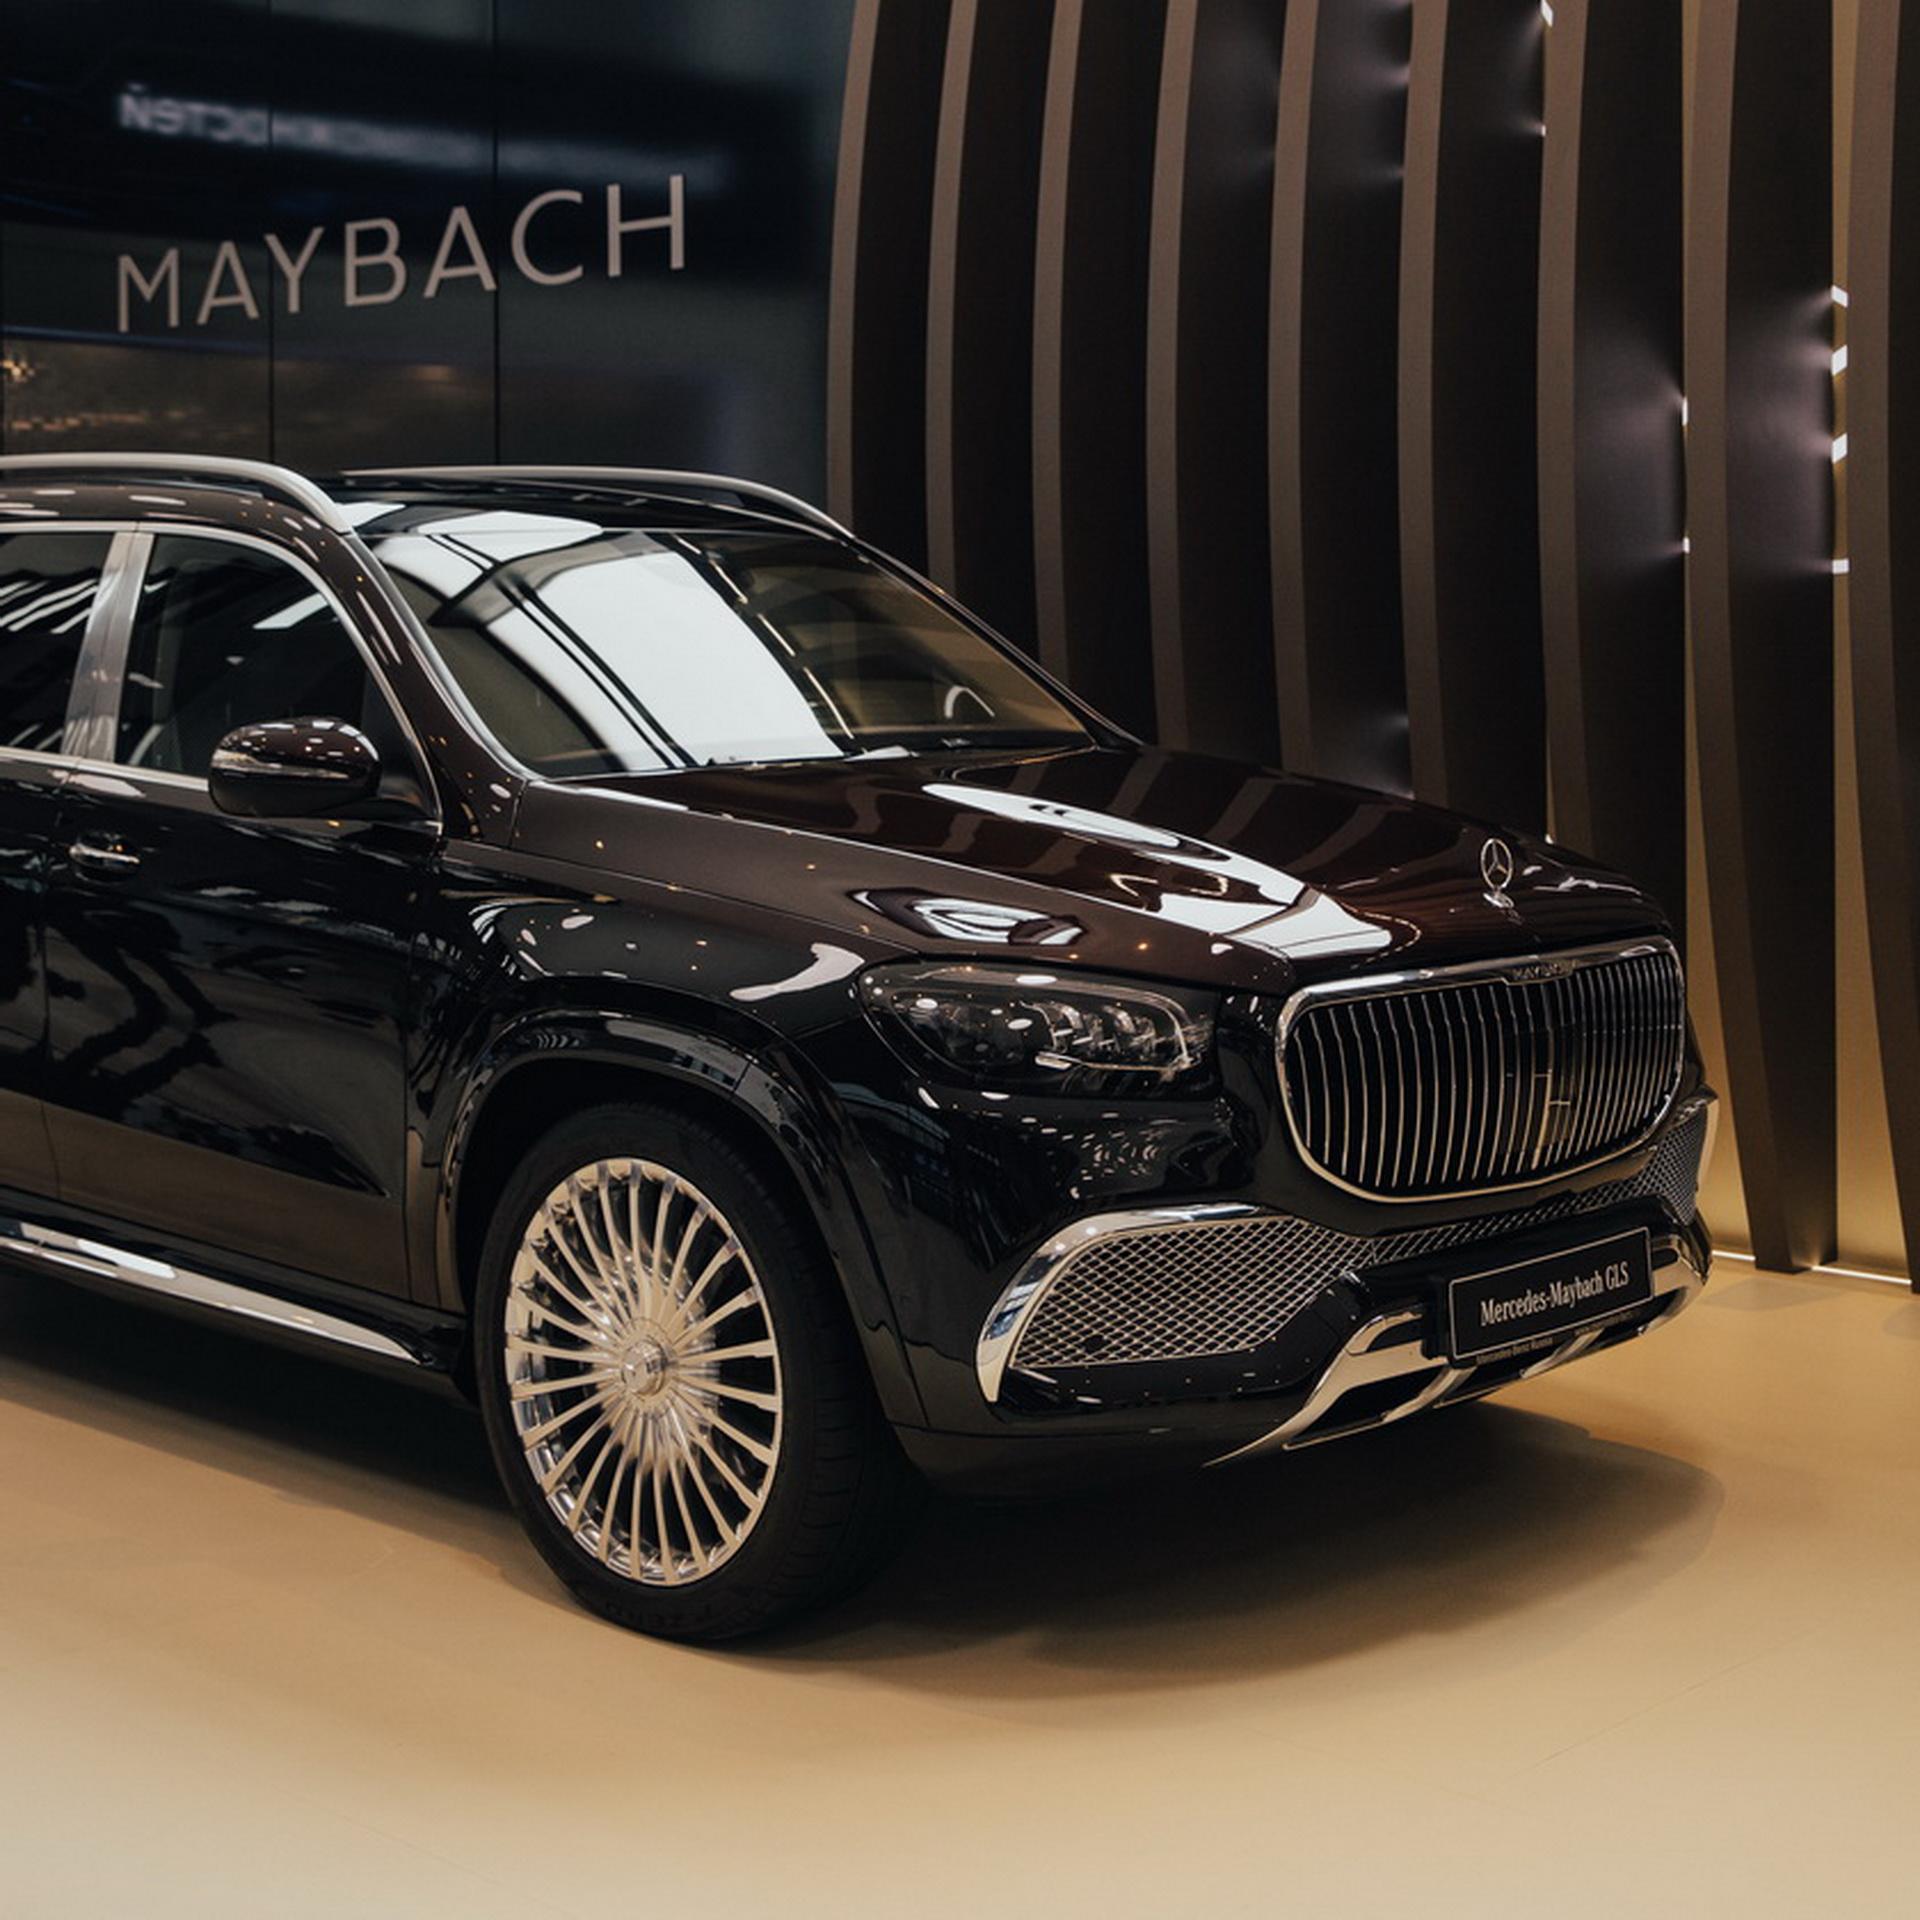 Mercedes-Maybach S-Класса был представлен на экономическом форуме_2